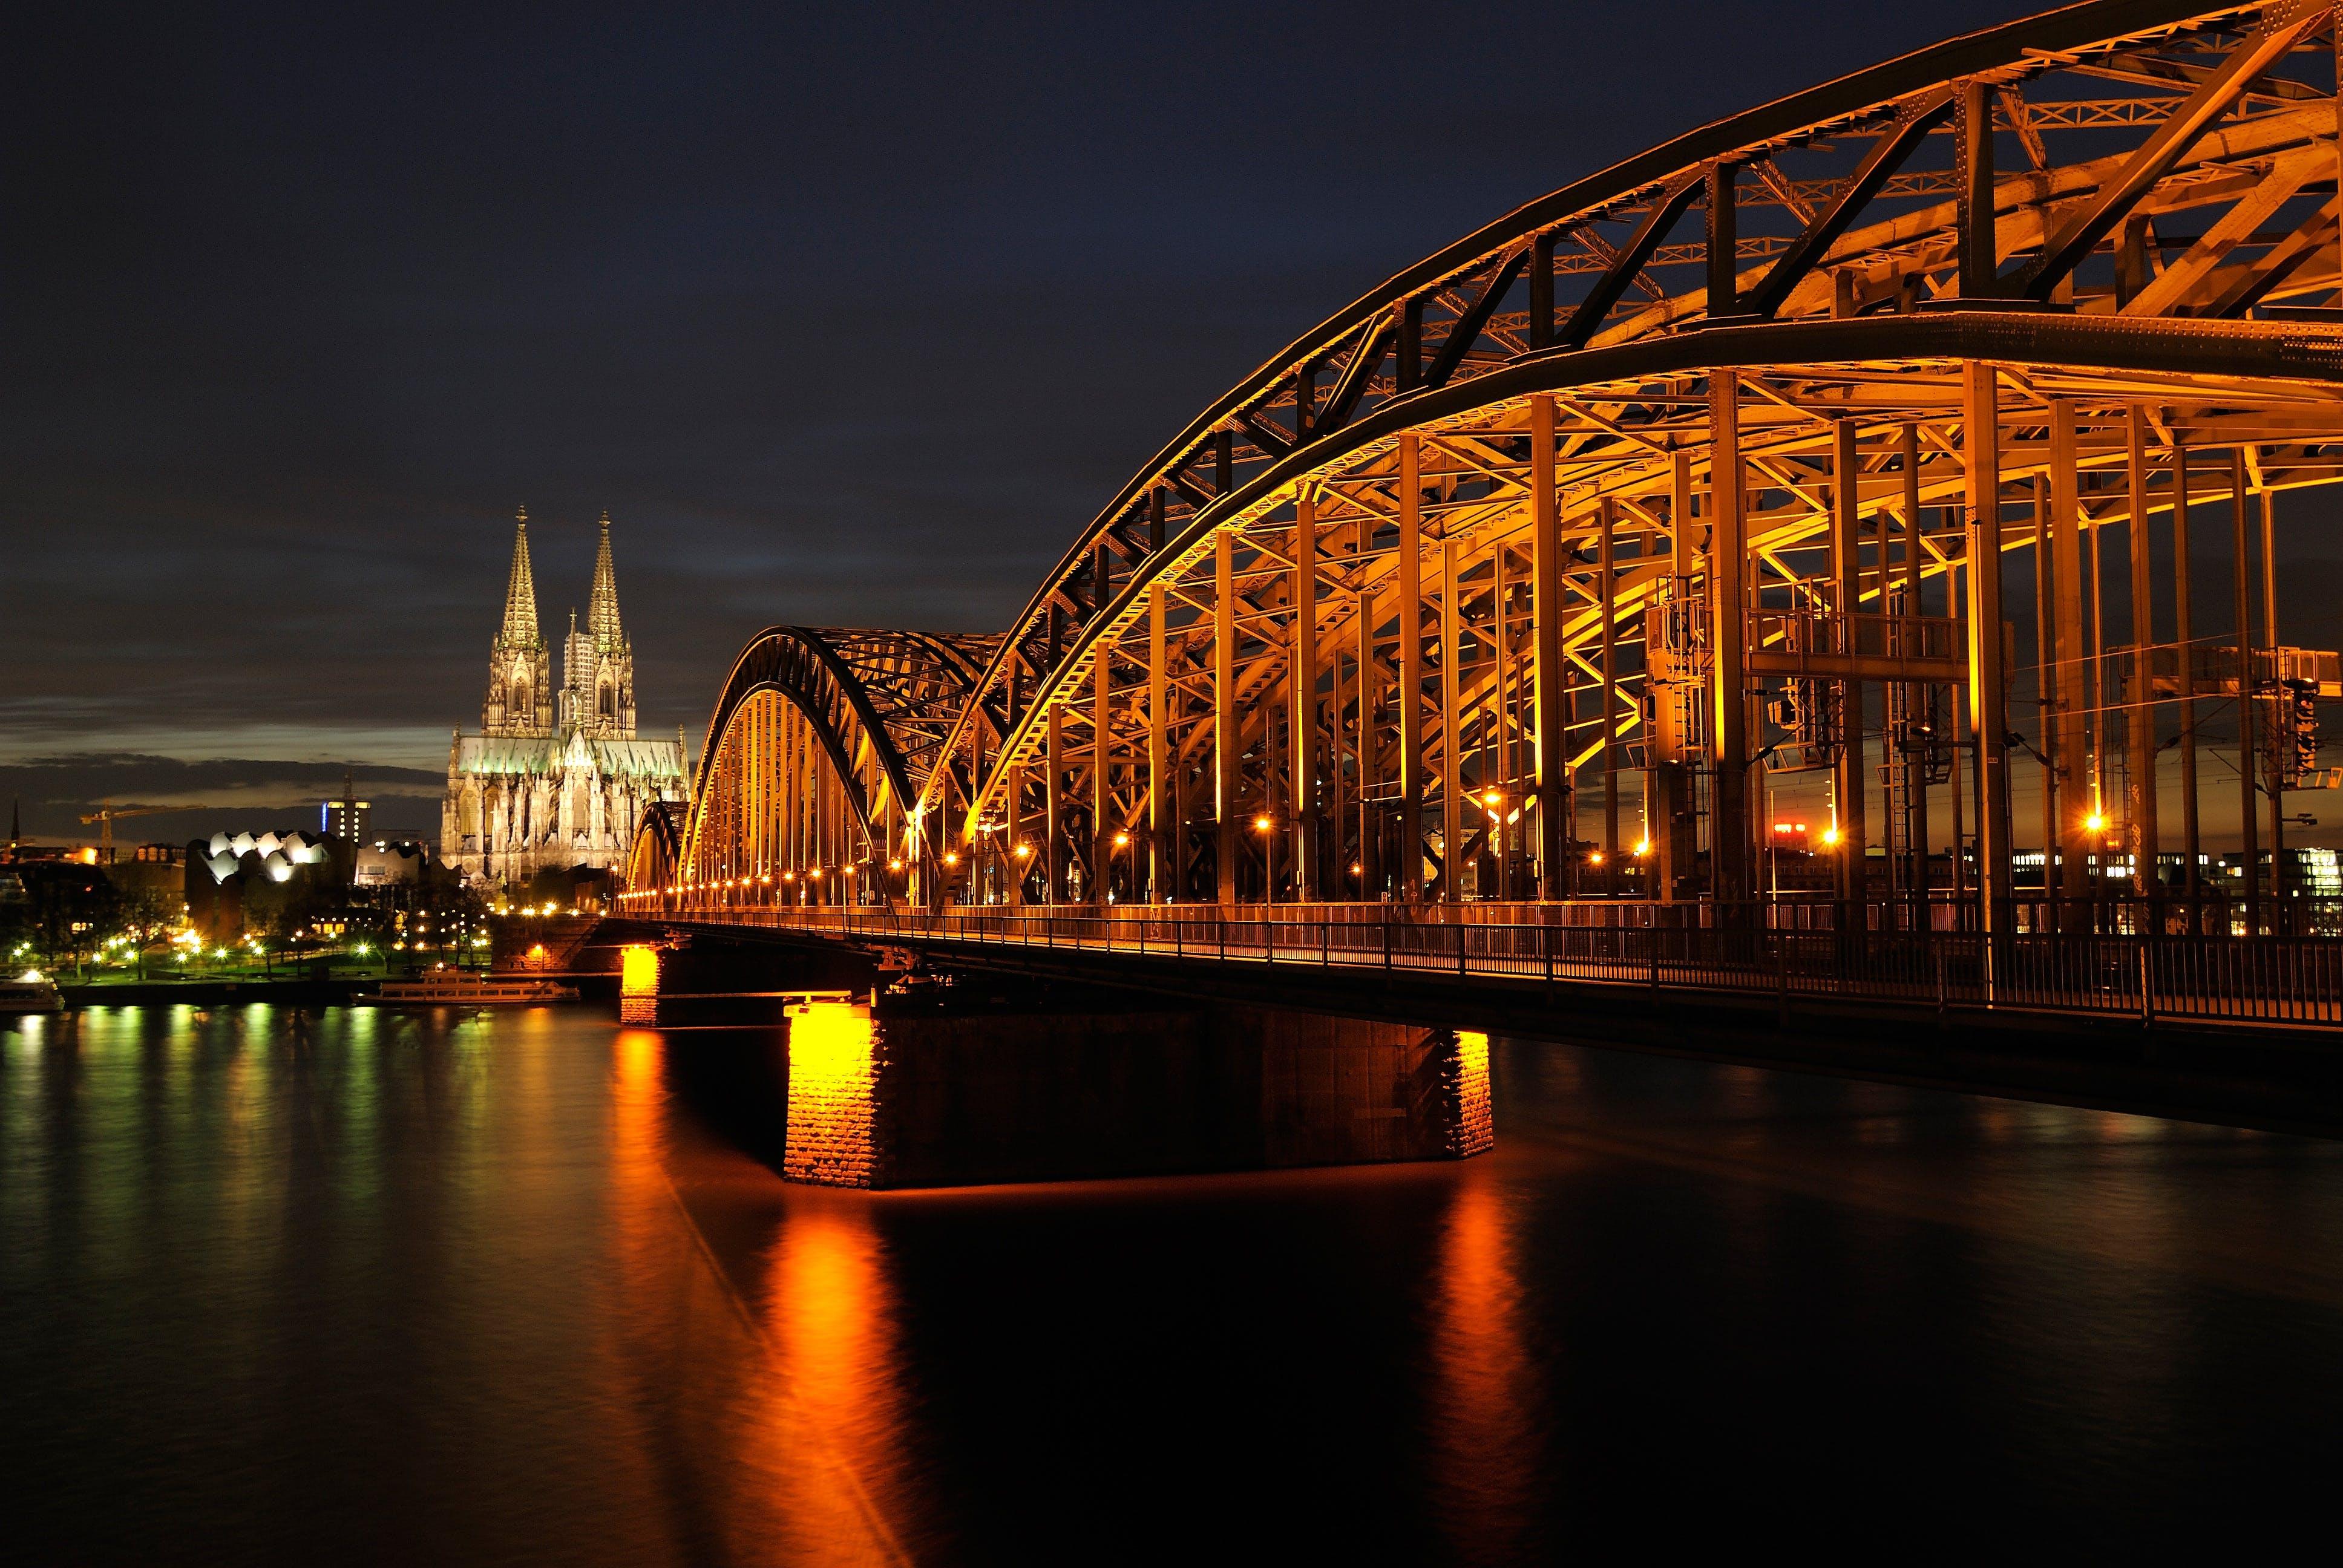 Gratis lagerfoto af arkitektur, bro, by, bylandskab